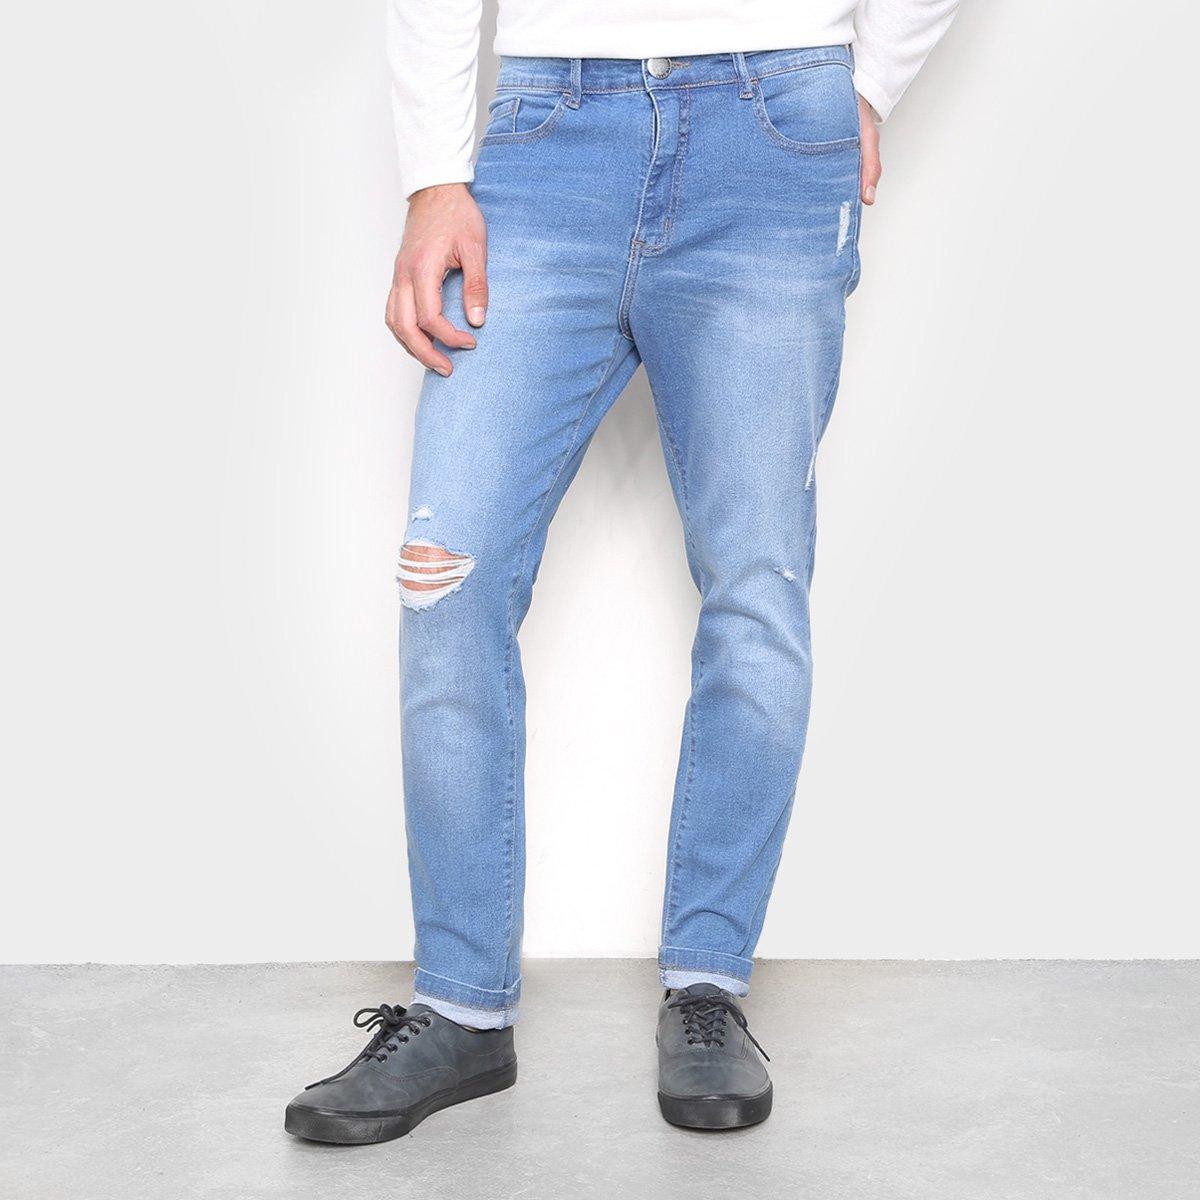 Calça Jeans Hering Taper Destroyed Masculina